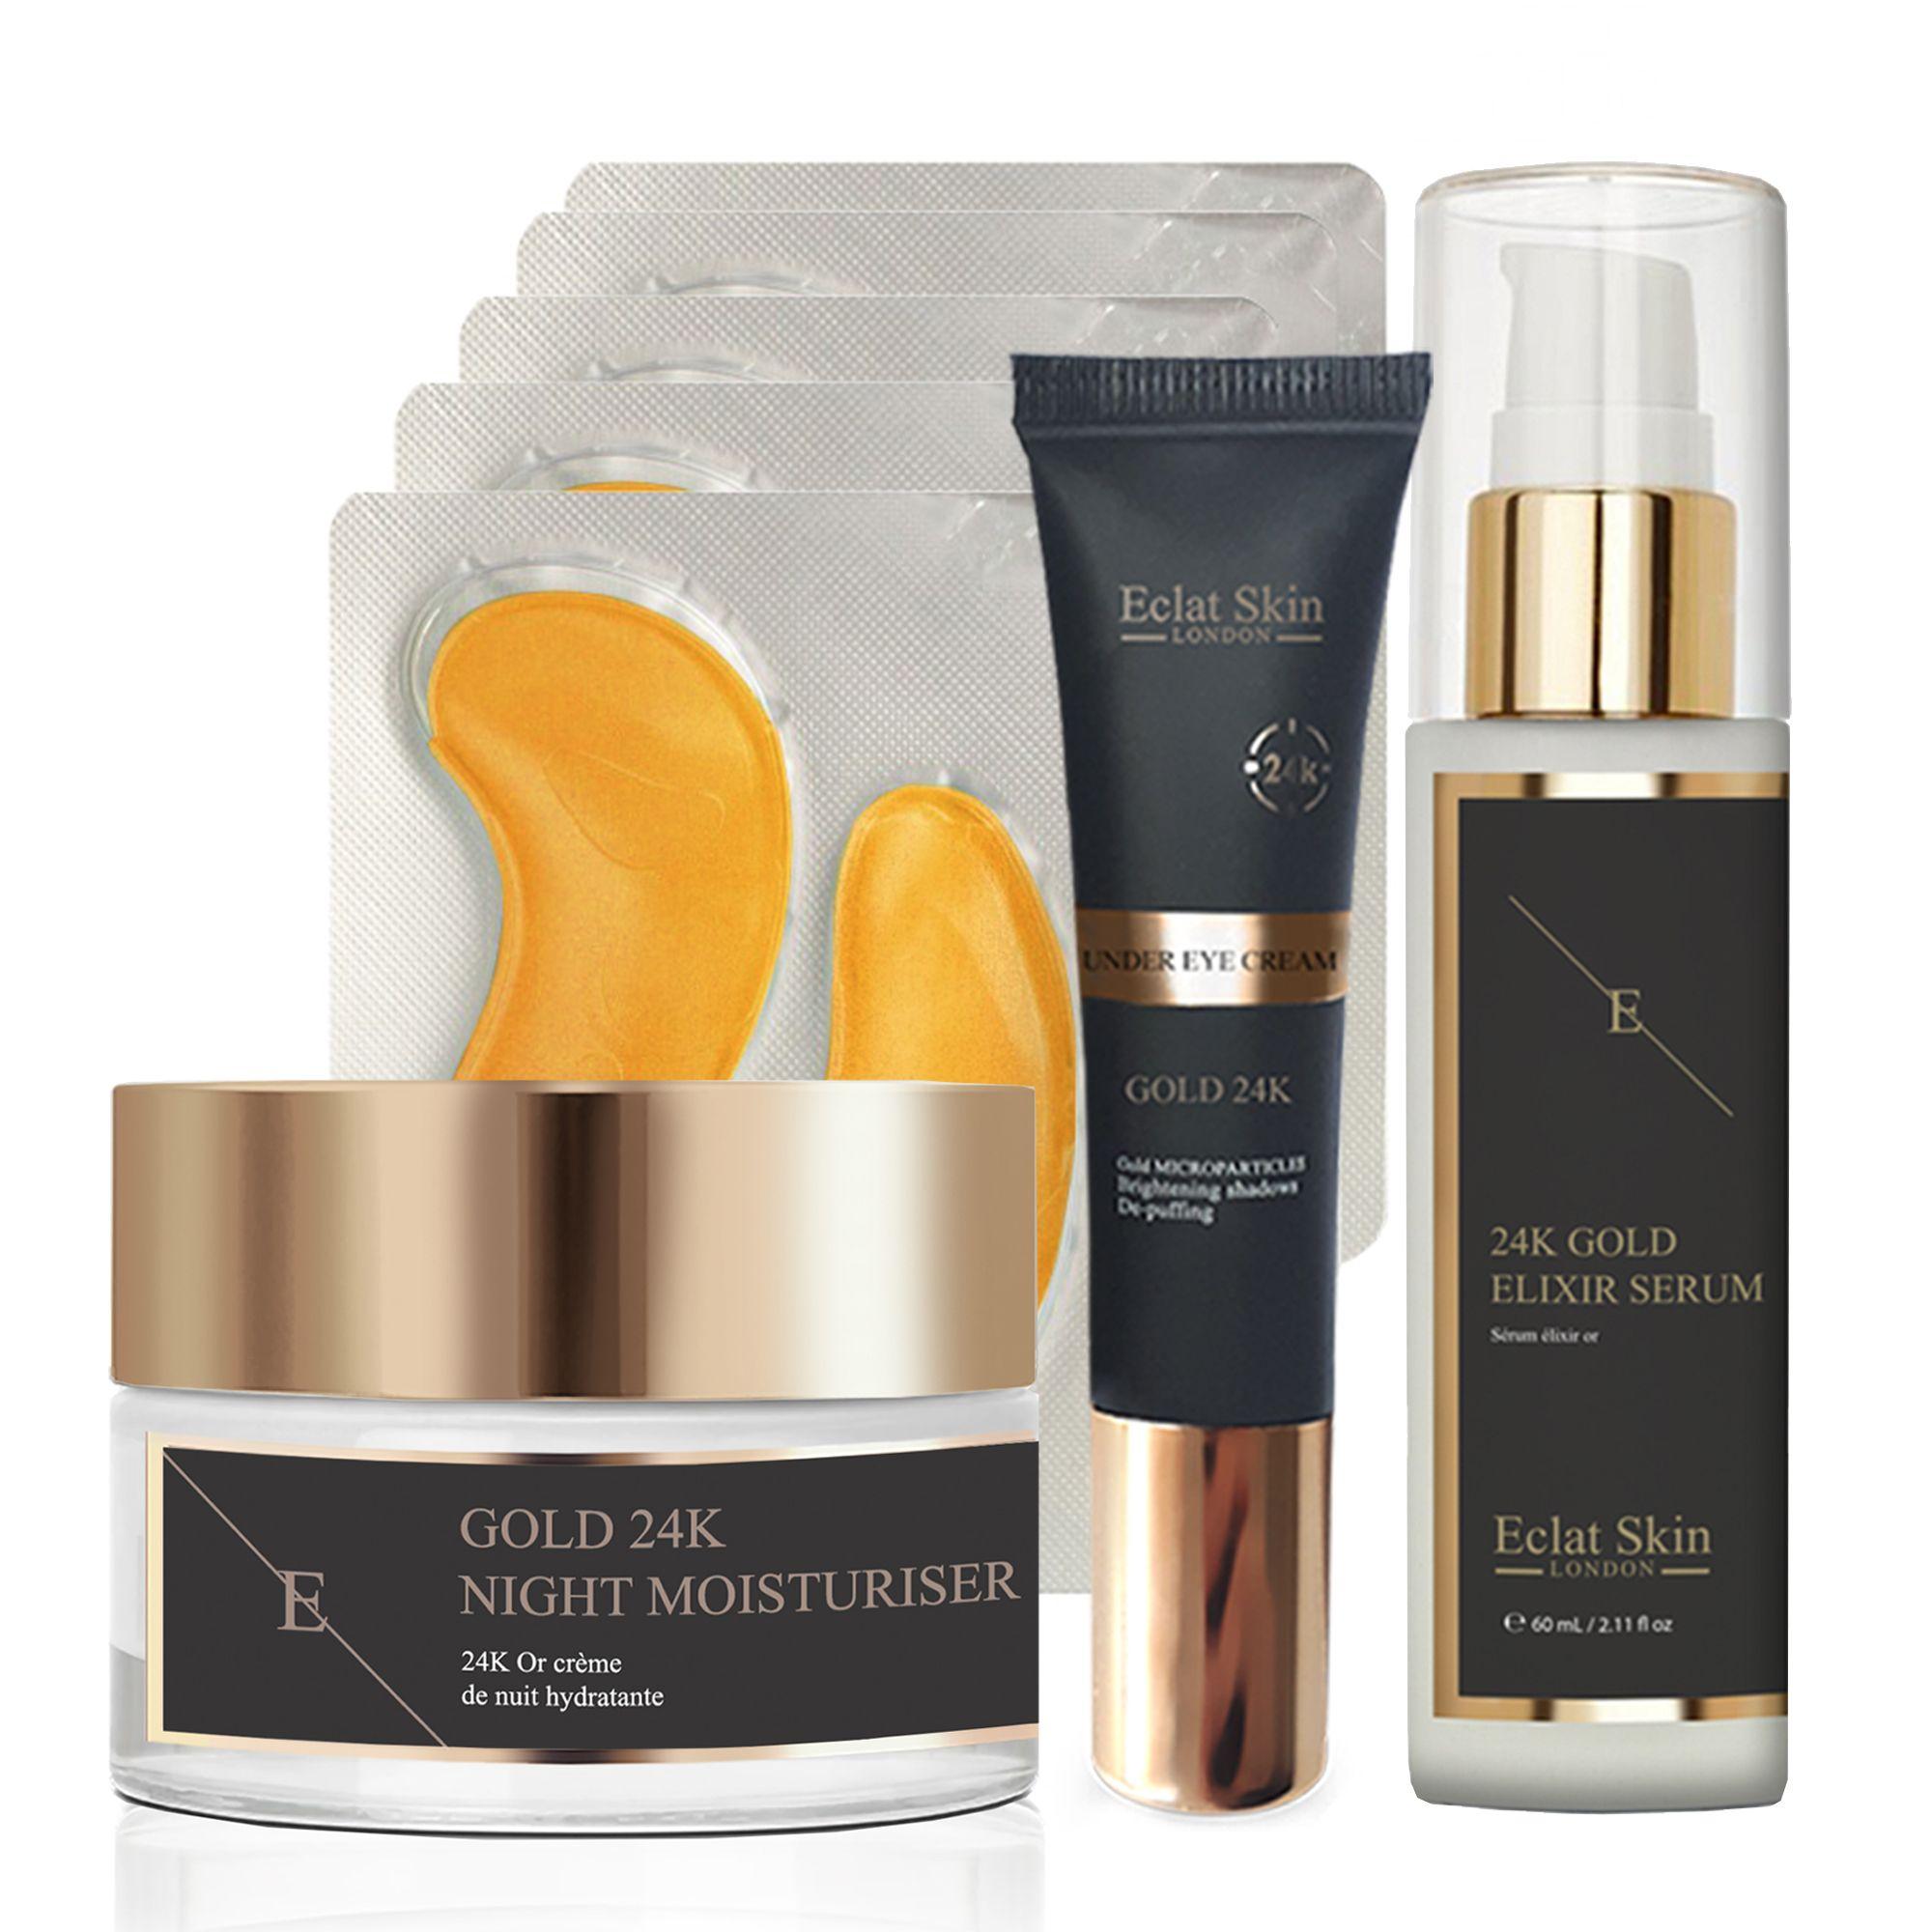 Anti-Wrinkle Elixir Serum 24K Gold + Anti-Wrinkle Night Moisturiser 24K Gold + Under Eye Cream 24K Gold + Collagen Gold Under Eye Patch 24K Gold - 5 x 2 Pads